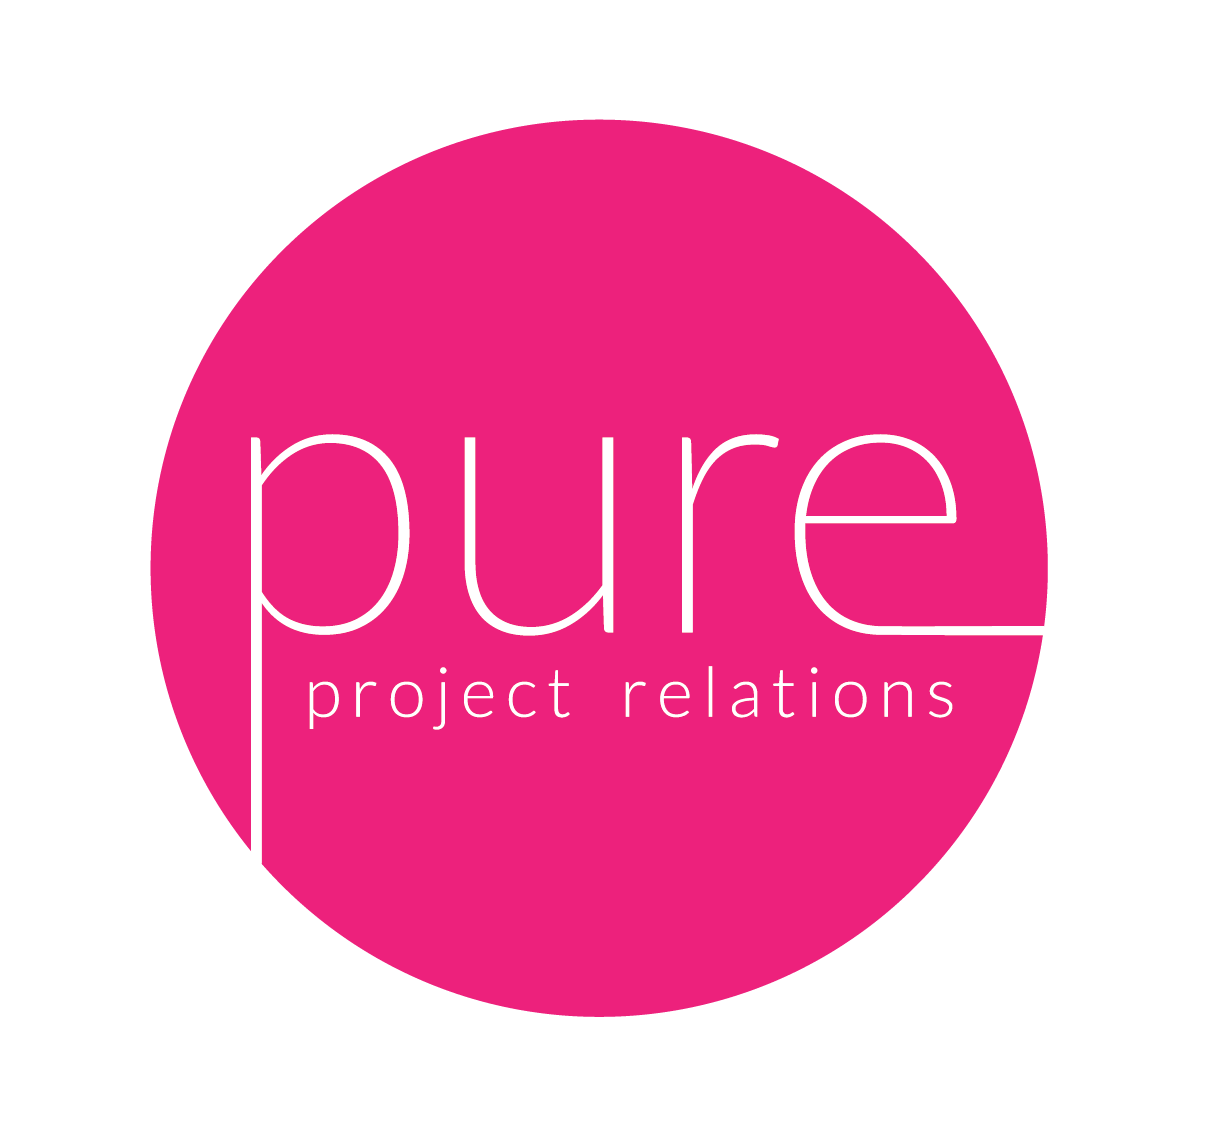 PurePR-logo.png